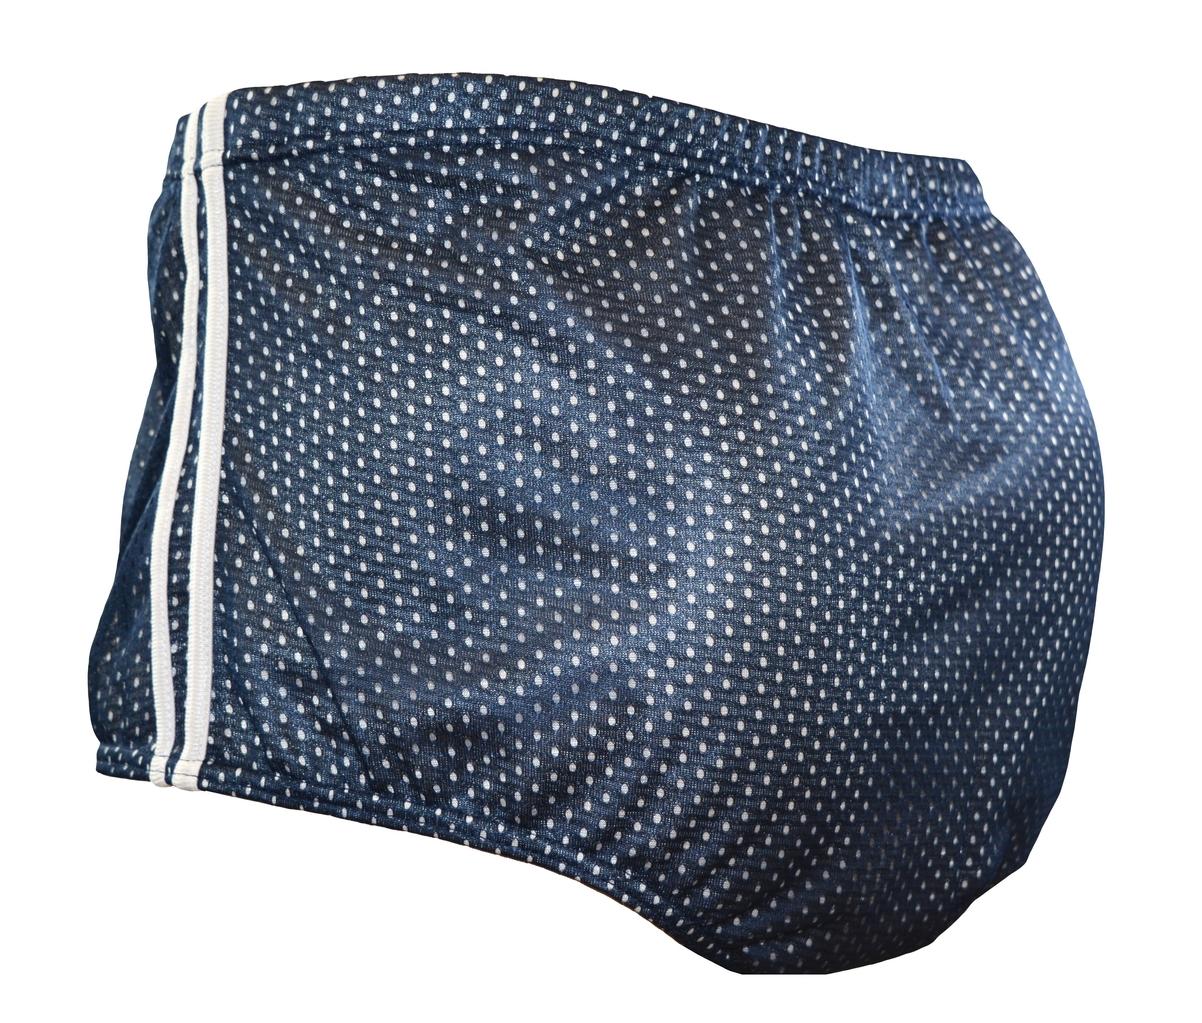 Adoretex Boys Mens Poly Mesh Training Drag Suit Swimsuit